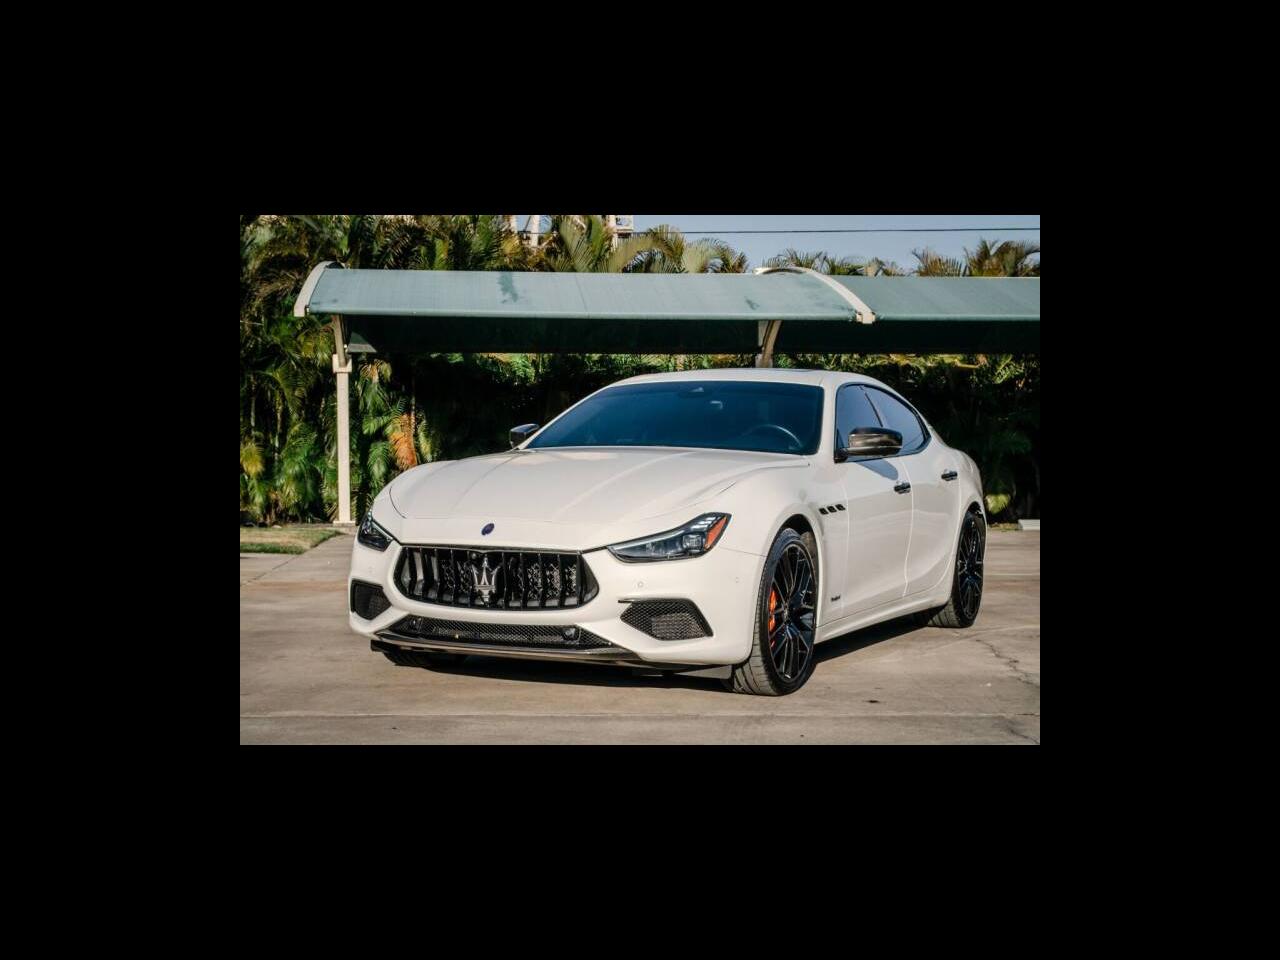 Maserati Ghibli S GranSport 2019